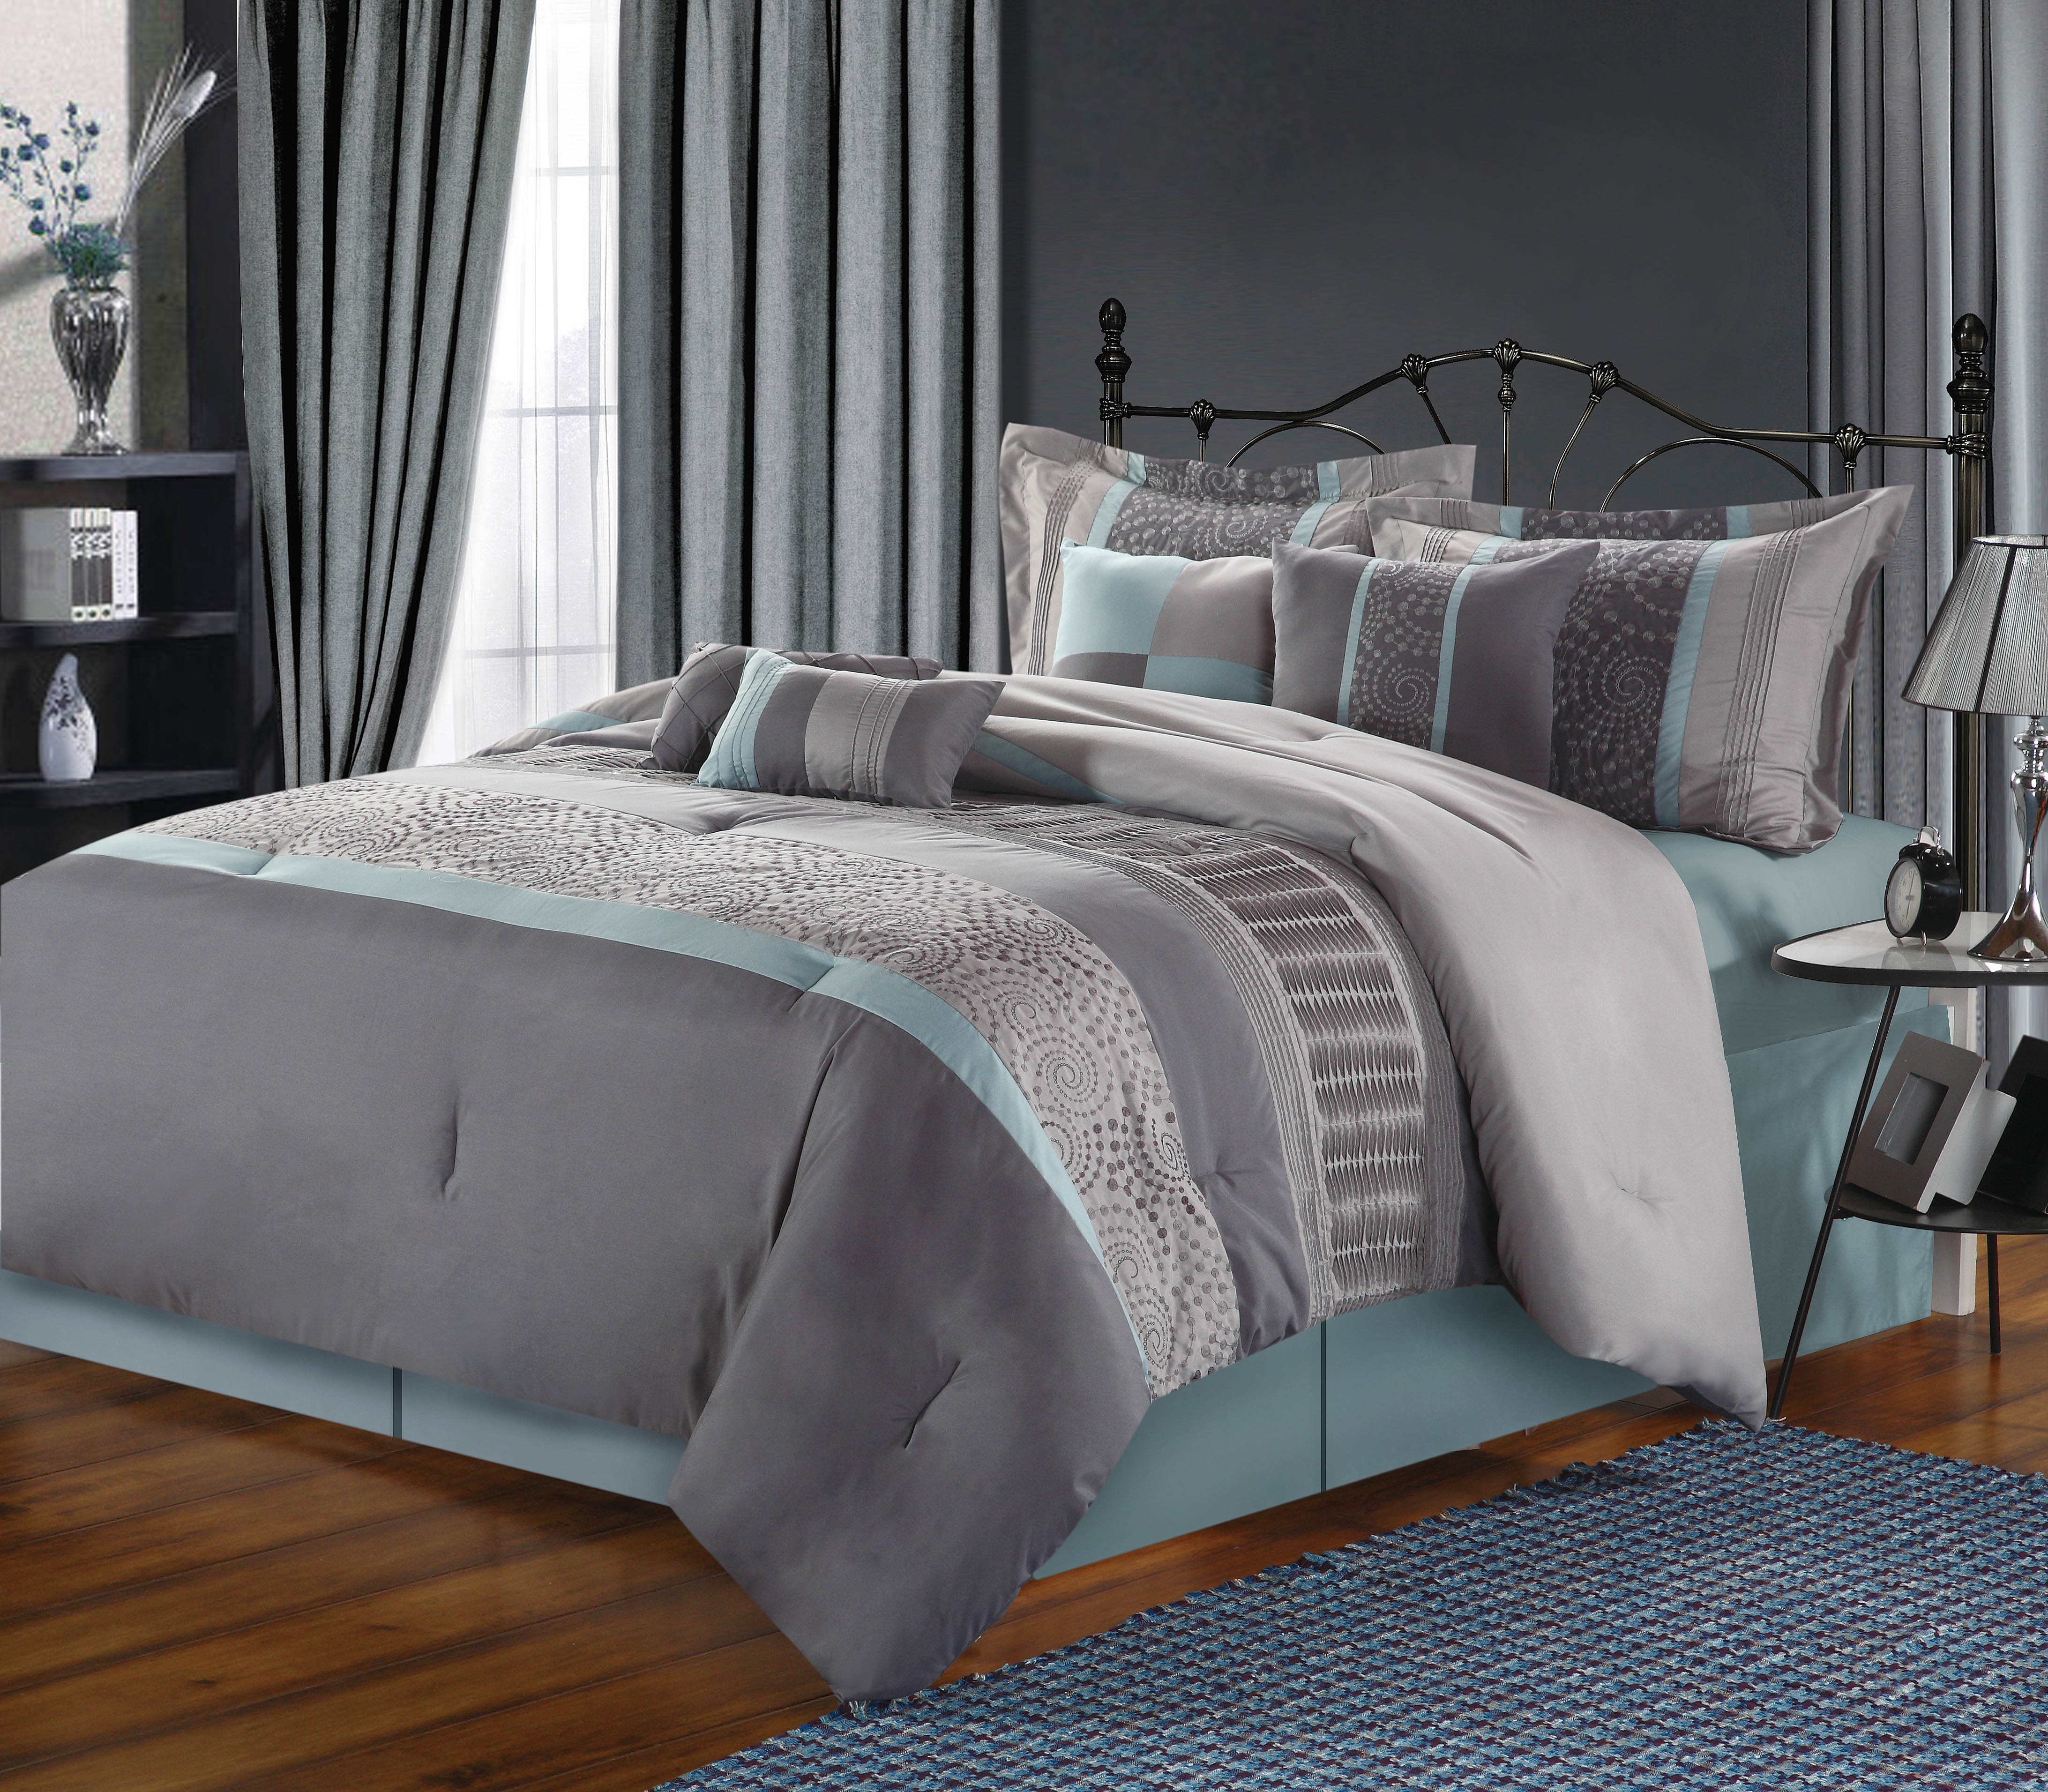 Chic Home Euphoria 8-Piece Embroidered Comforter Set, Aqua Queen